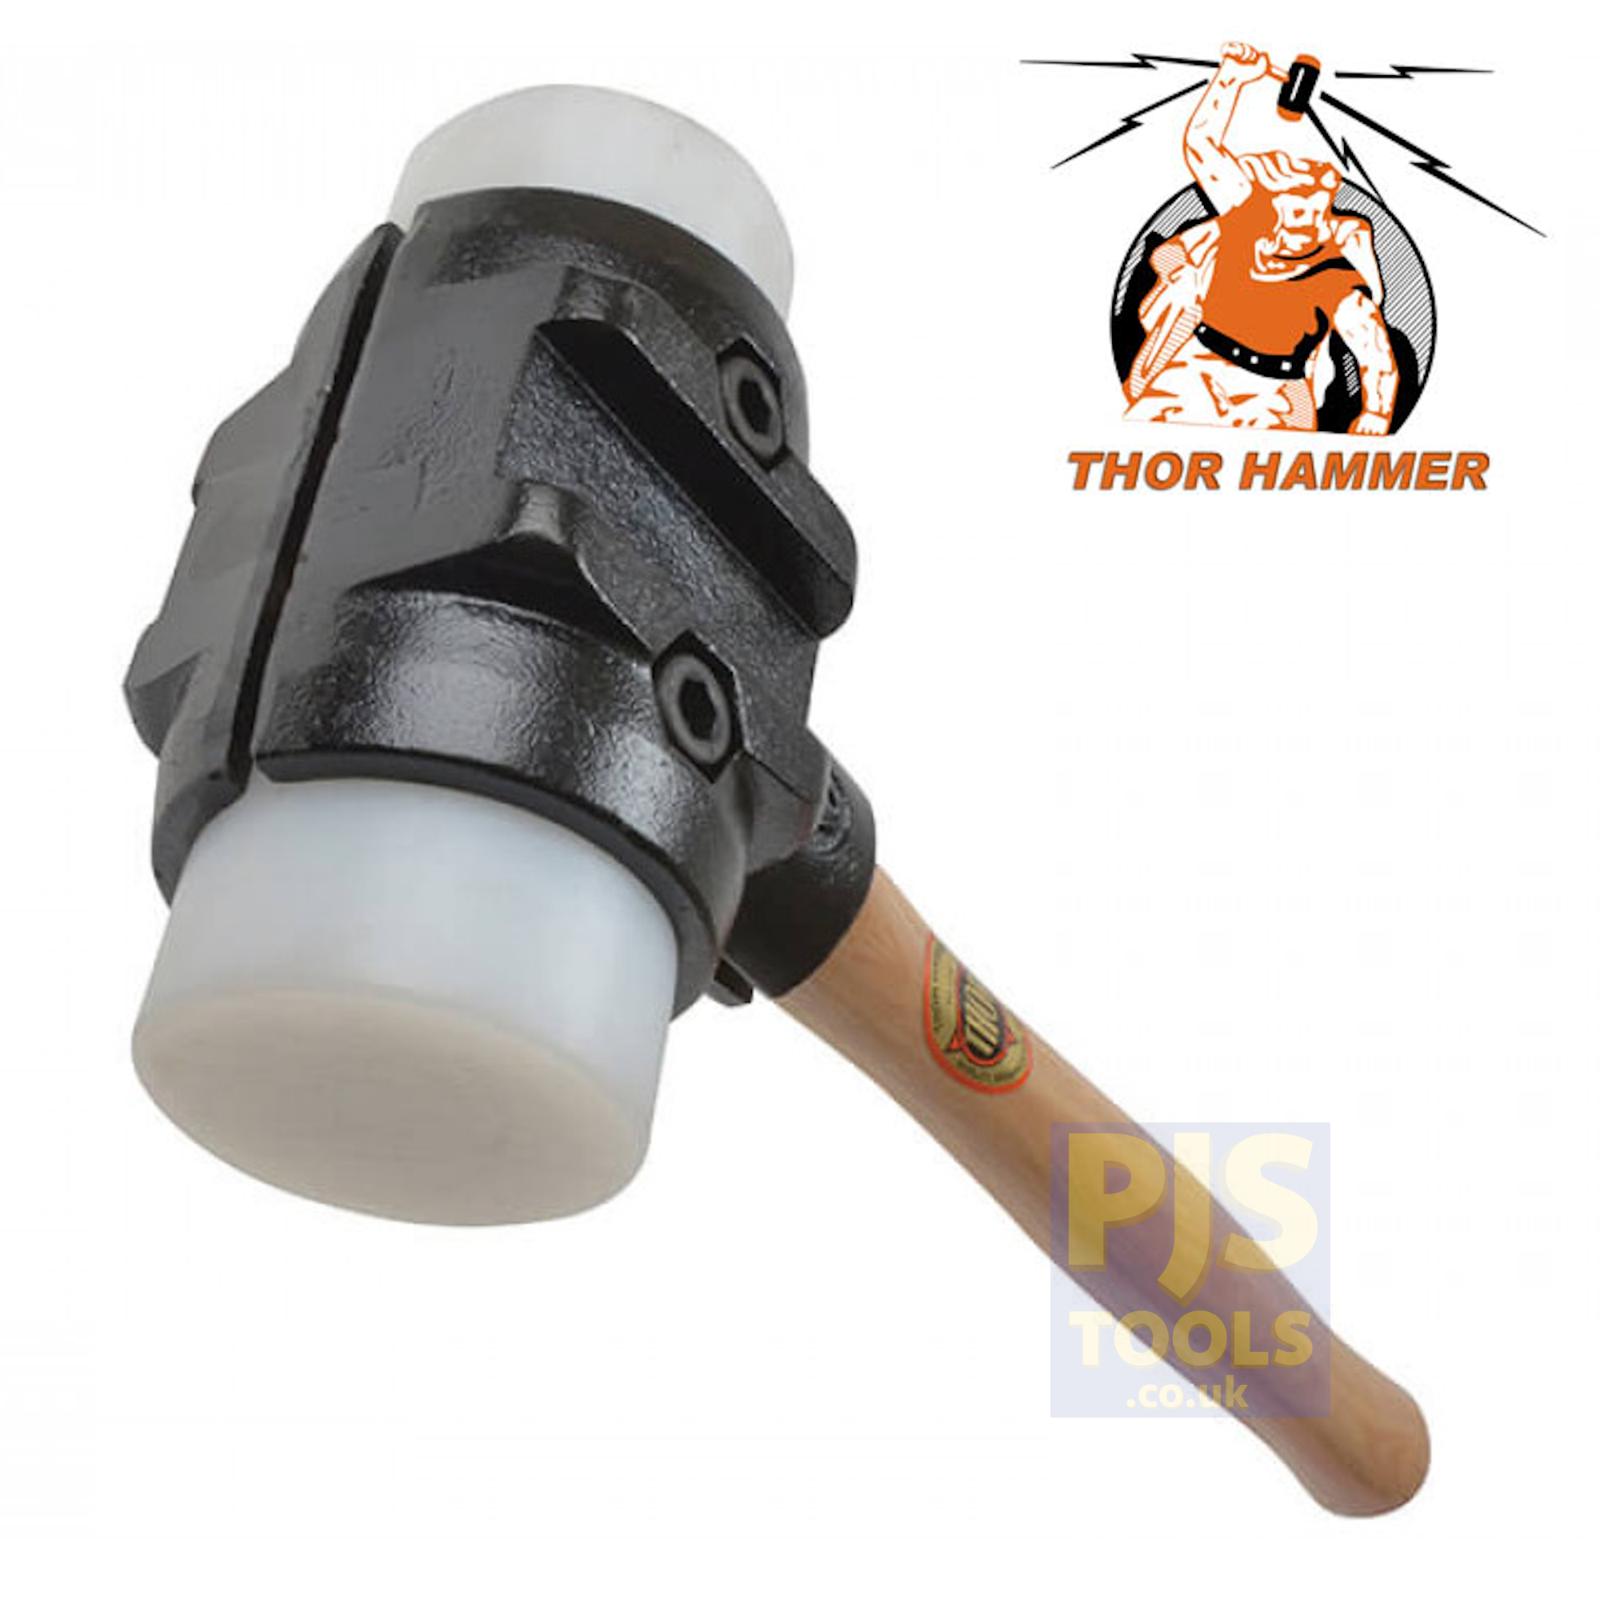 Thor 35-SPH275 70mm Größe 5 super plastic split head mallet hammer kerblaying